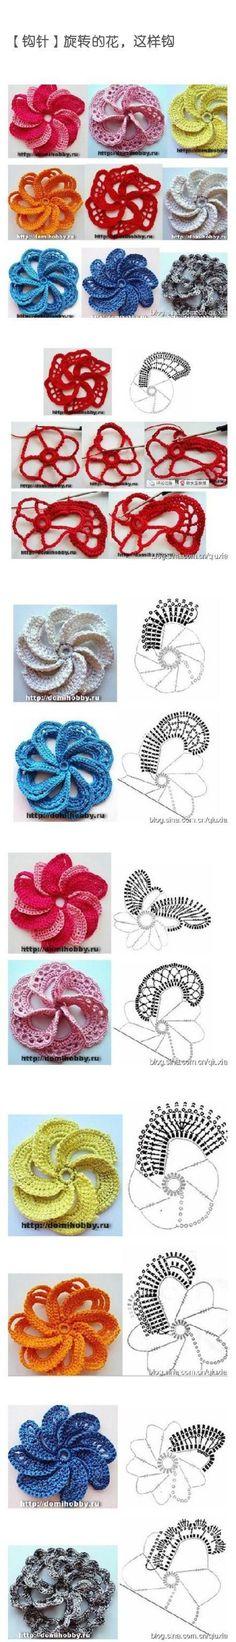 Irish Crochet Flower (chart + tutorial) by tonya. Crochet Diy, Freeform Crochet, Crochet Chart, Love Crochet, Crochet Motif, Irish Crochet, Crochet Stitches, Spiral Crochet, Crochet Diagram